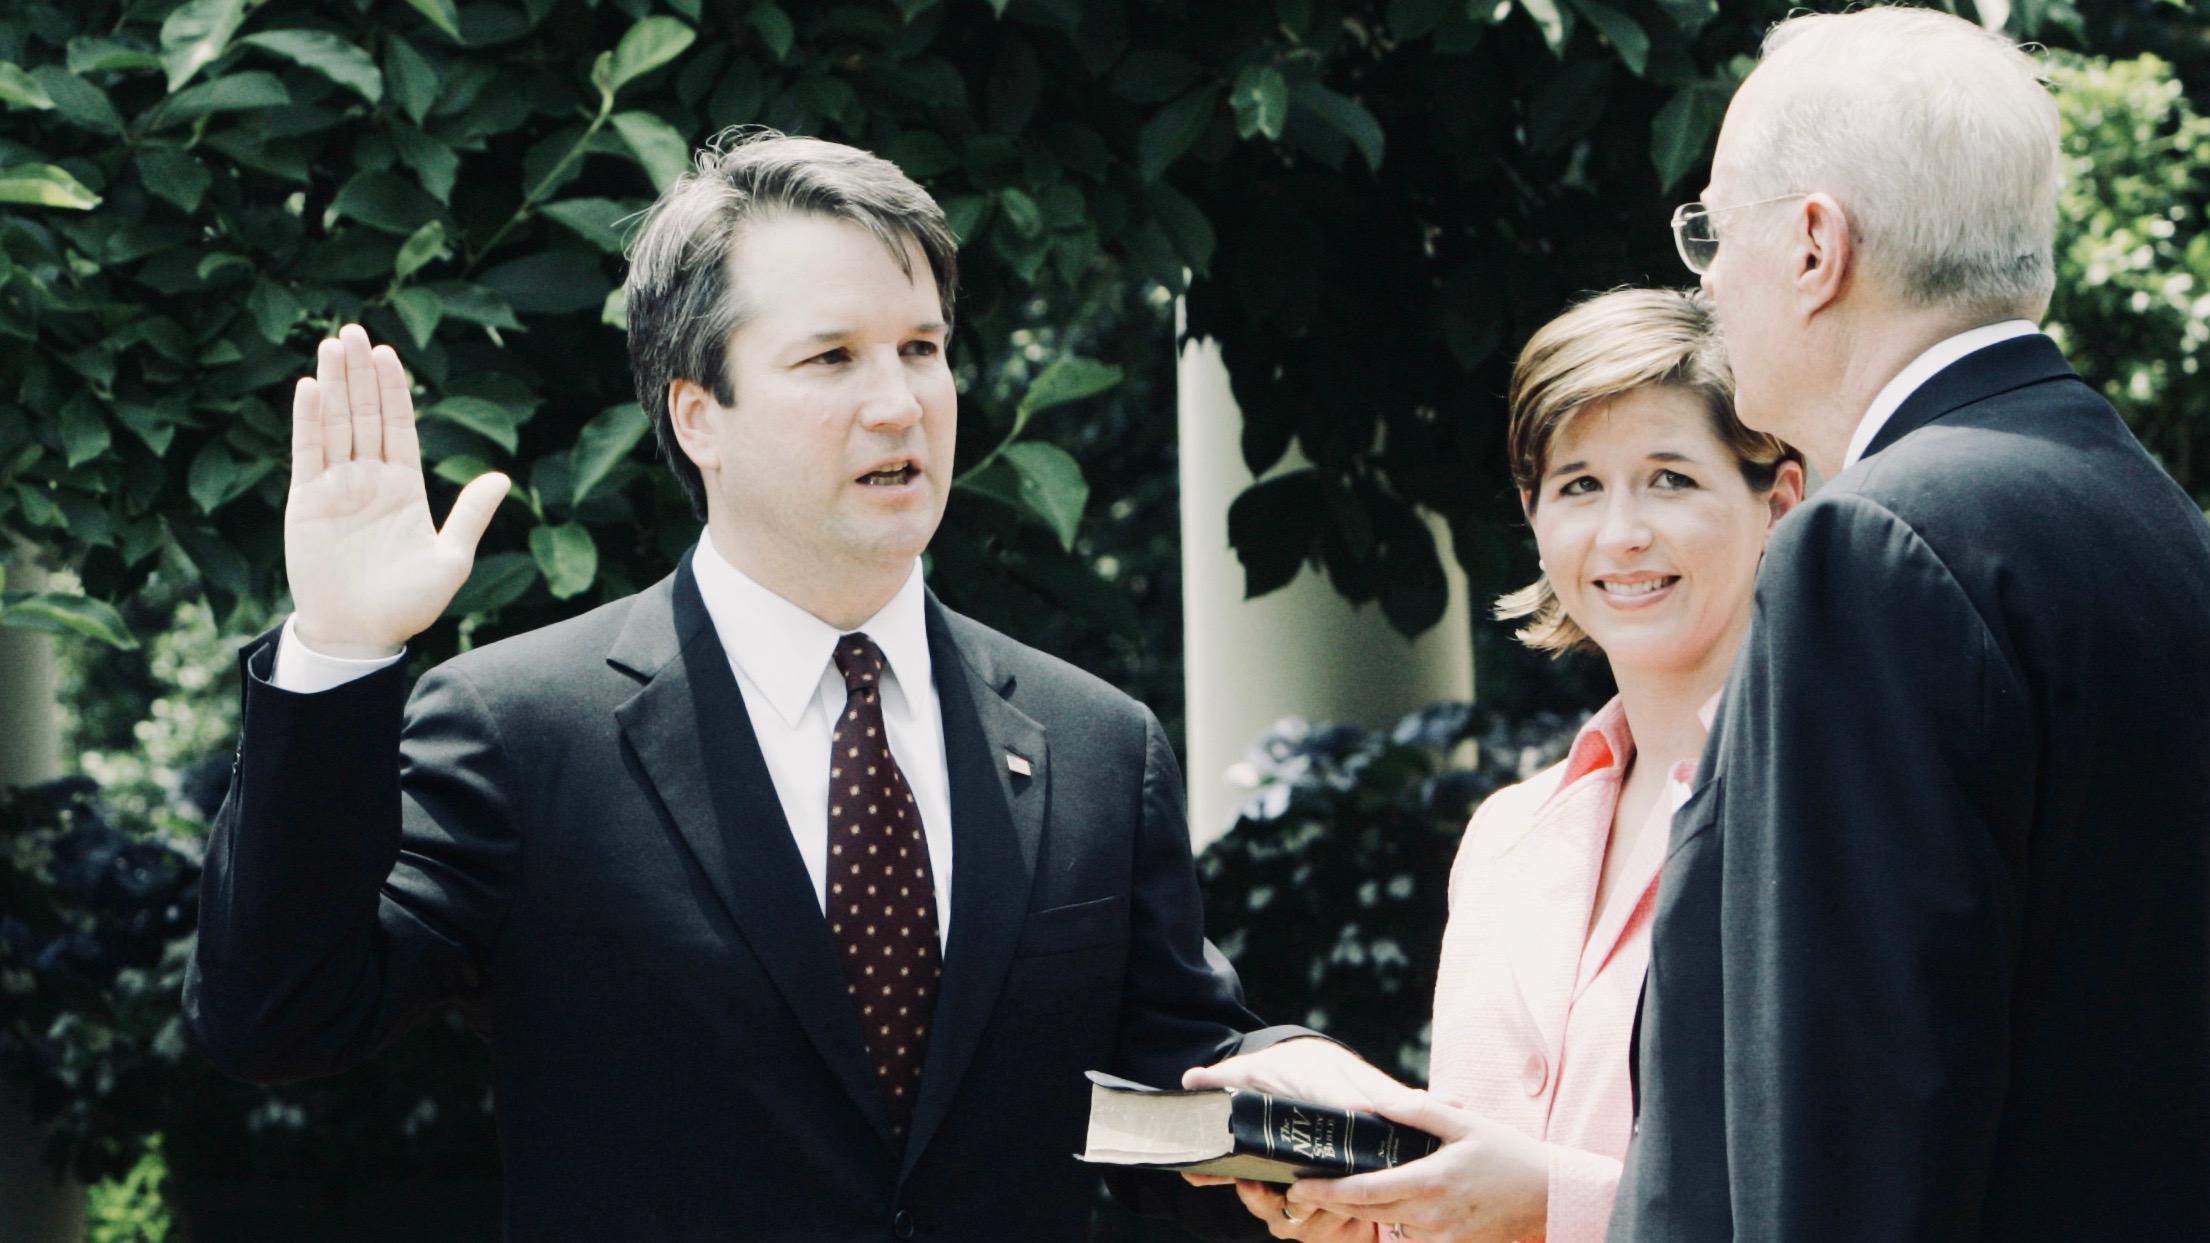 In Fox News interview, Kavanaugh sets a blueprint for Senate hearing